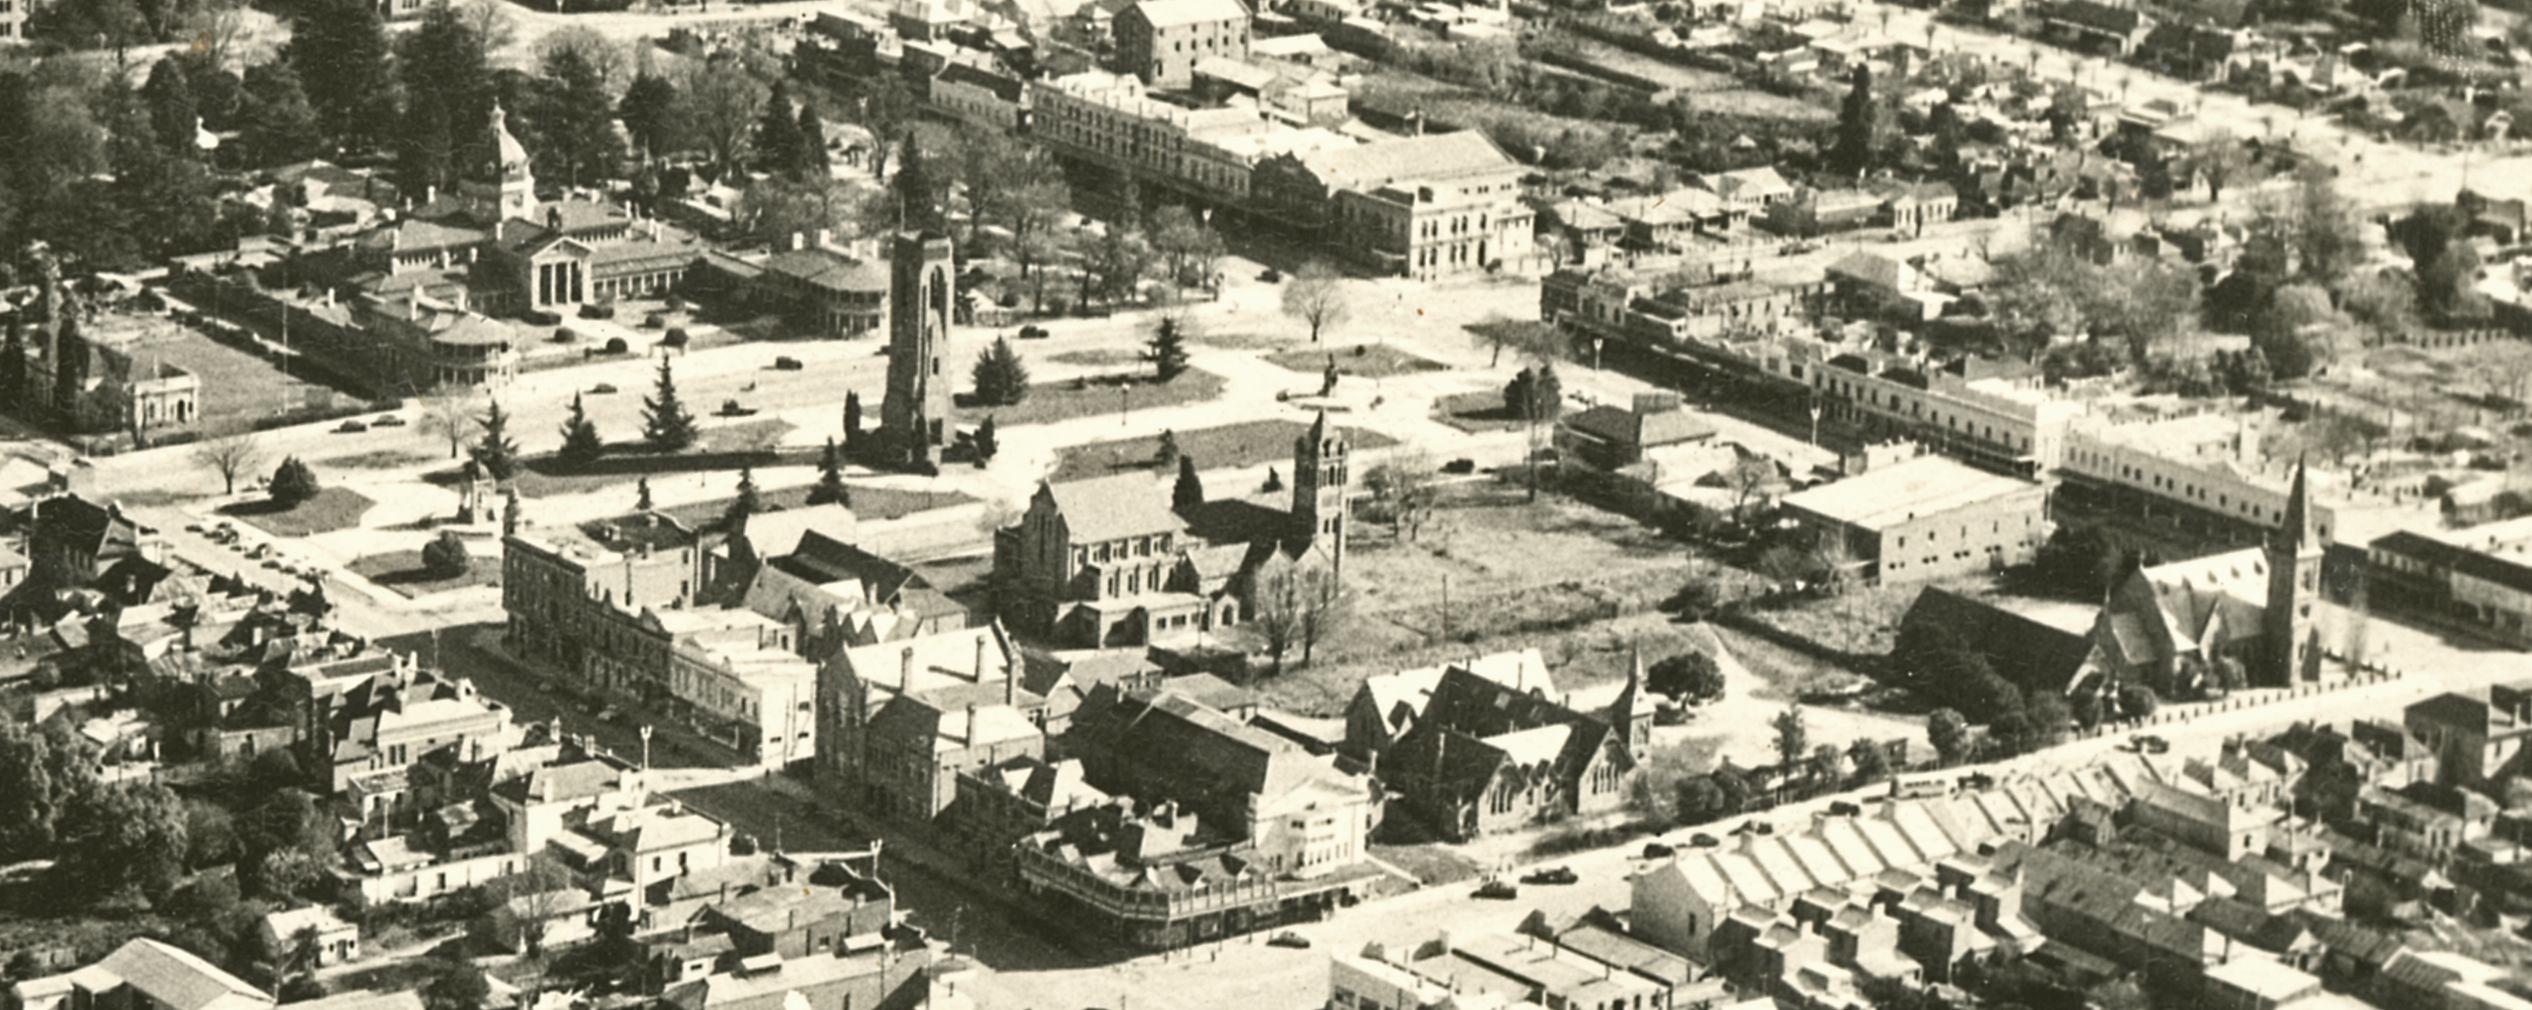 C1955 - Aerial photograph of central Bathurst